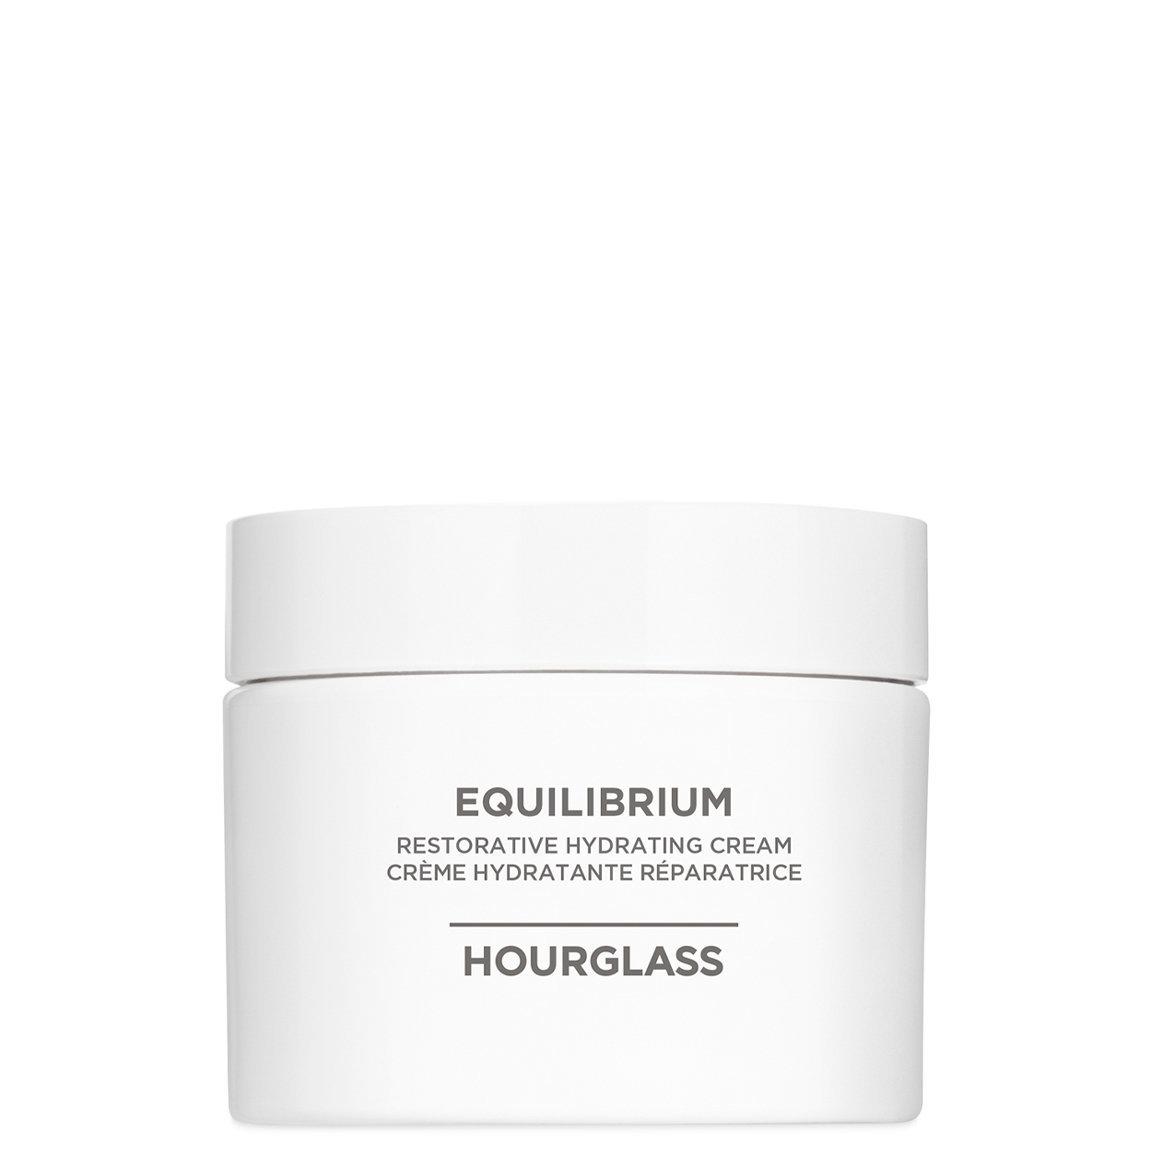 Hourglass Equilibrium Restorative Hydrating Cream alternative view 1 - product swatch.